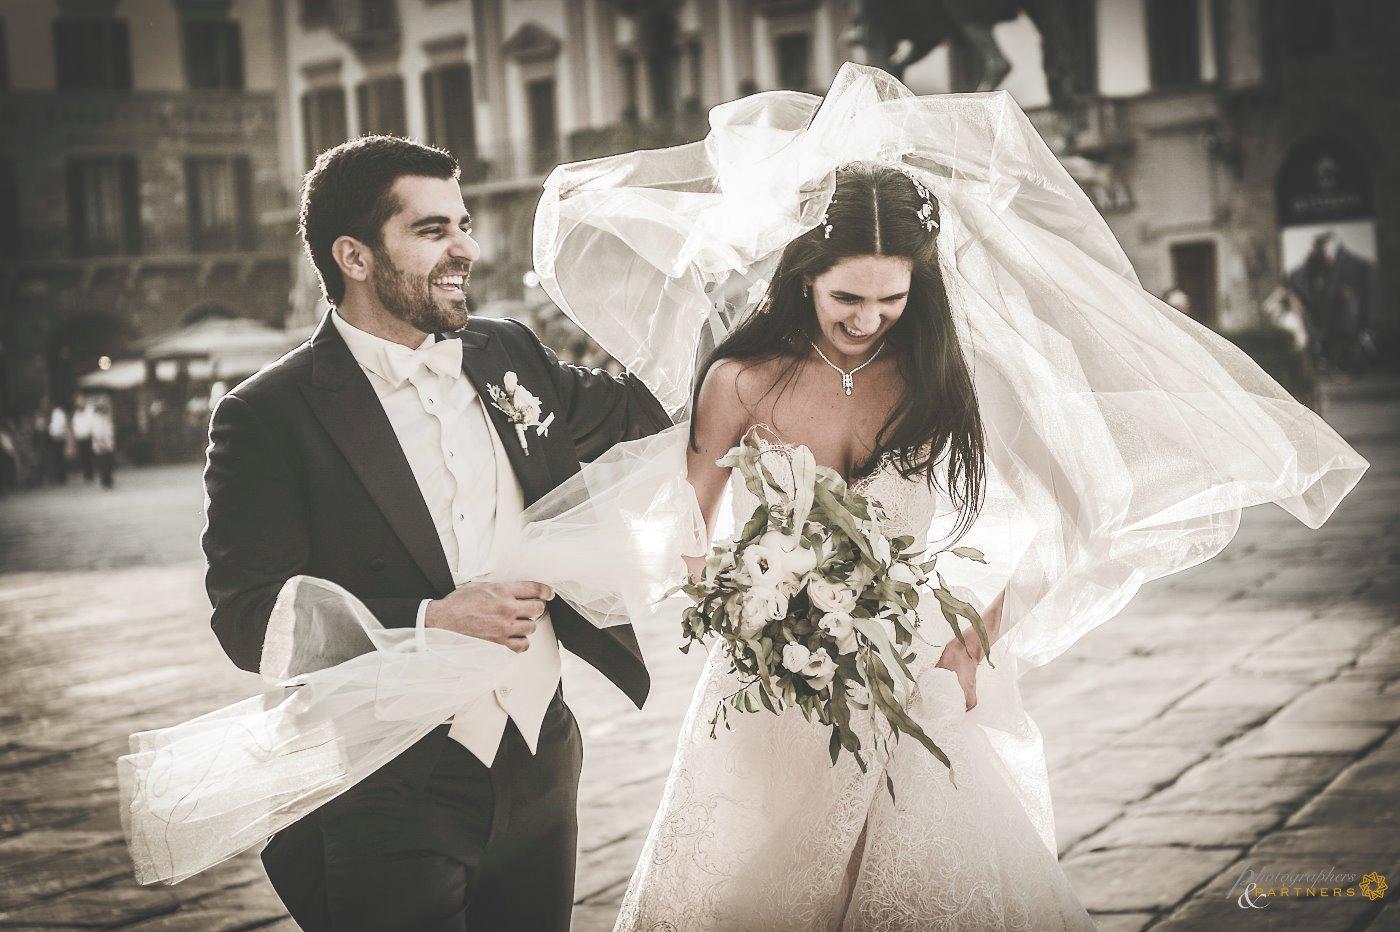 photography_weddings_florence_17.jpg